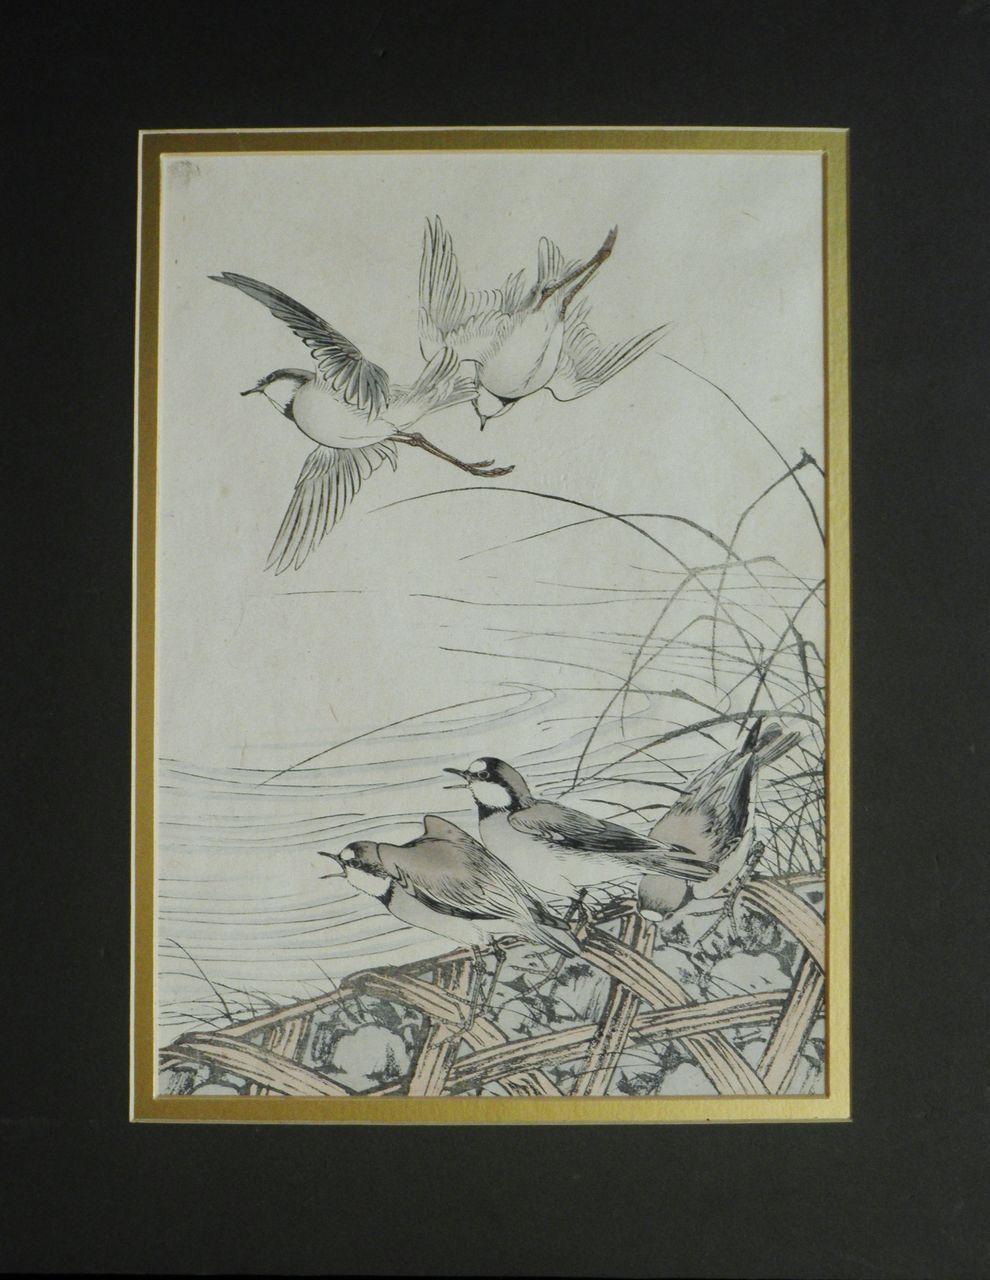 Nishimura Hodo Woodblock Print. Birds and Reed.